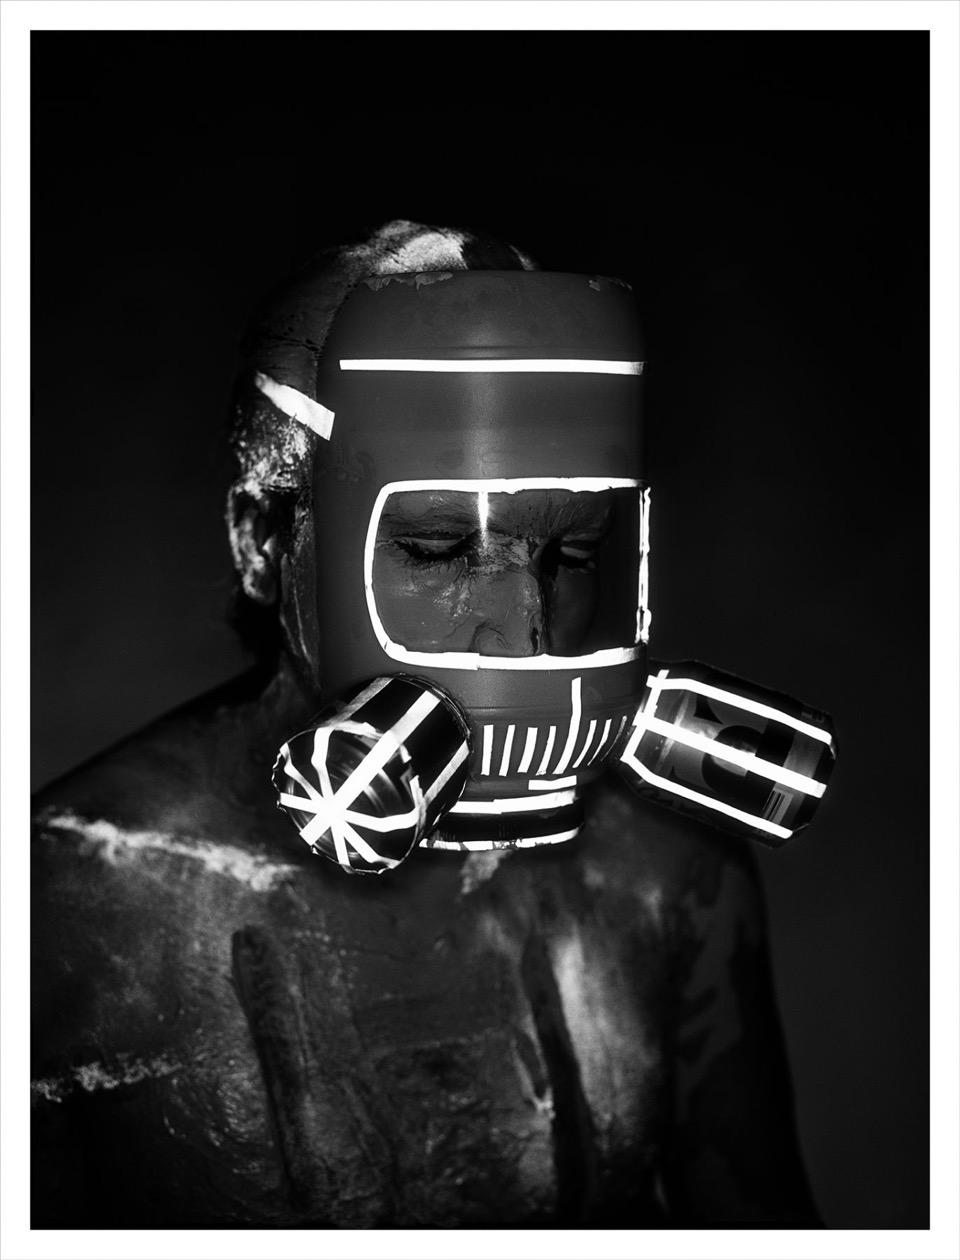 Rodrigo Valenzuela, Mask #7 , 2018,Archival pigment print mounted on Sintra,33.25 x 23 inches (framed). Image courtesy of the artist